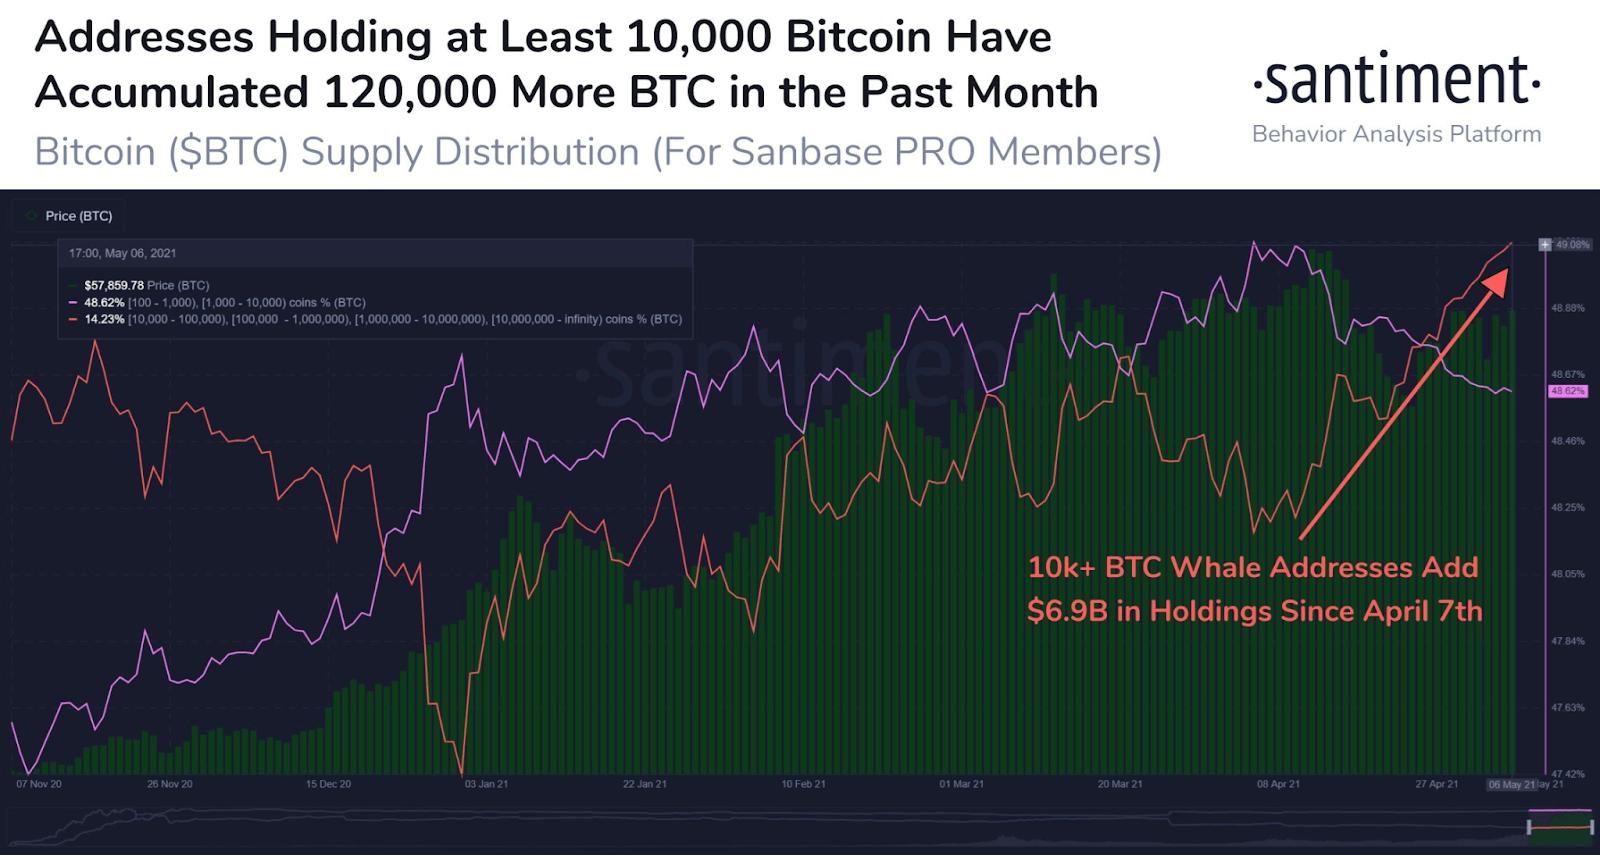 Santiment Chart - Addresses Holding > 10,000 Bitcoin